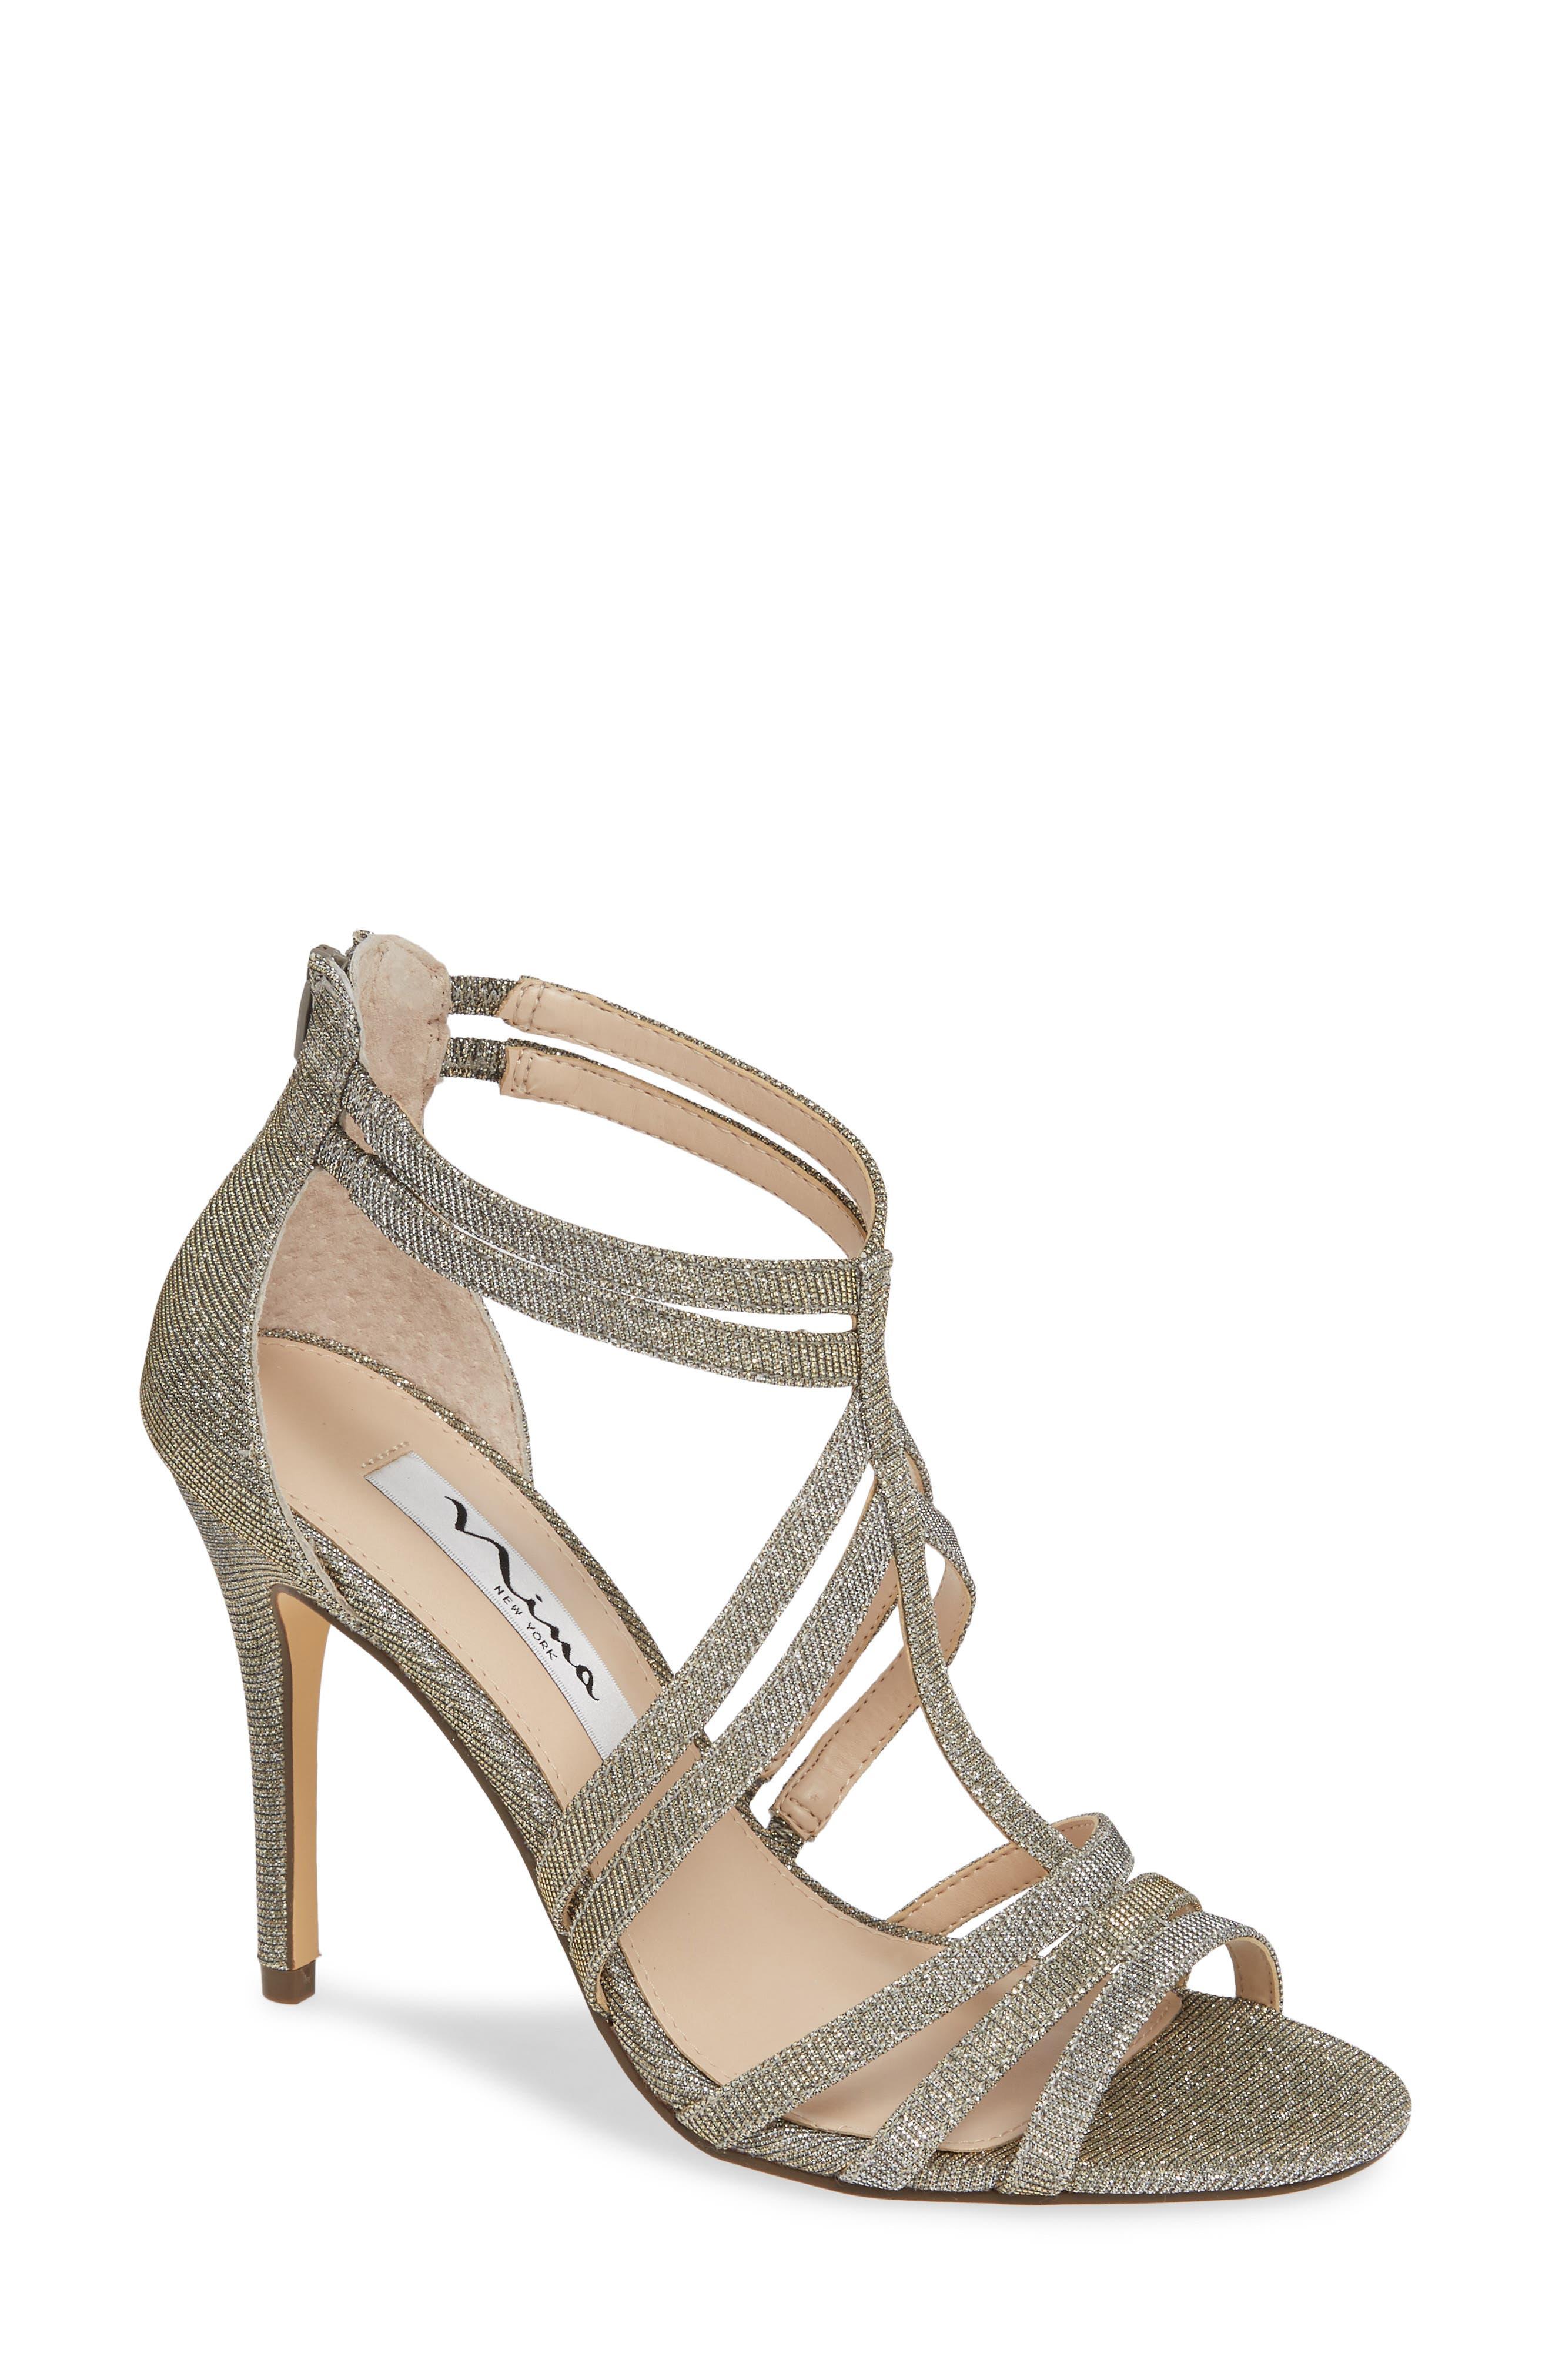 ,                             Carlie Ankle Strap Sandal,                             Main thumbnail 1, color,                             STEEL GLITTER FABRIC